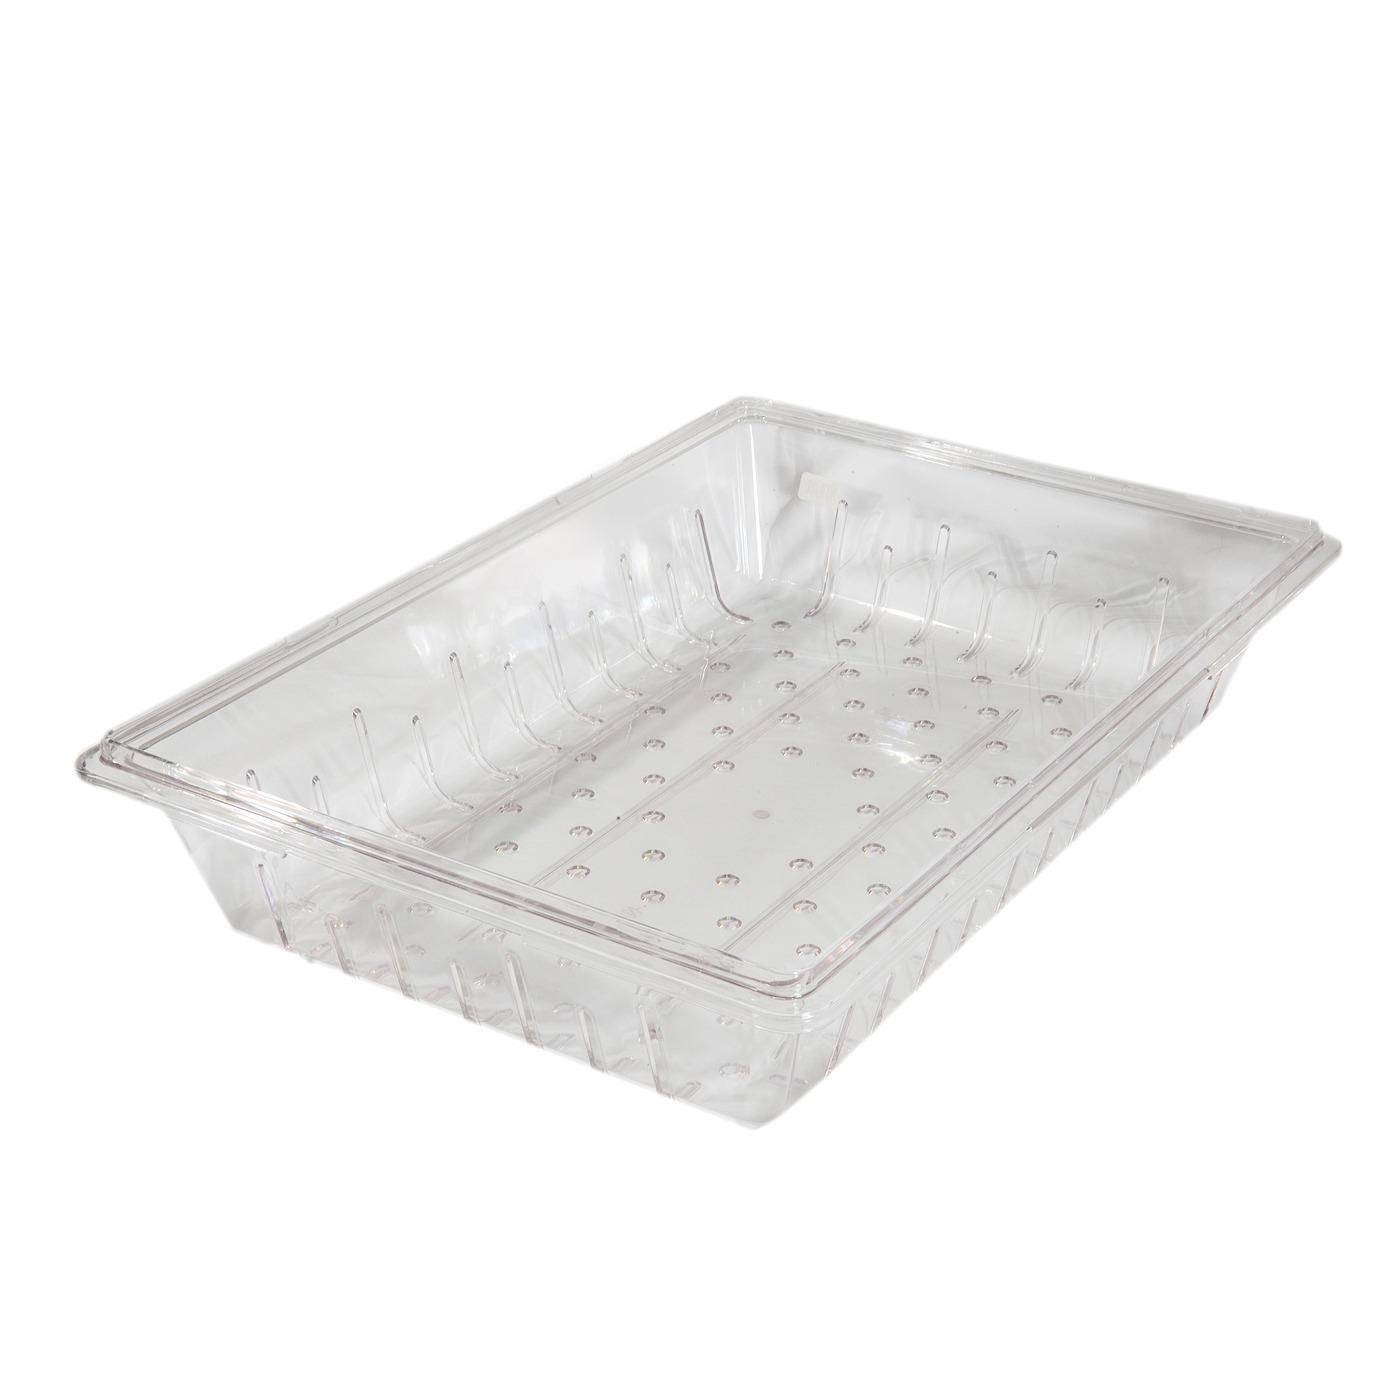 Ice Tub Strainer